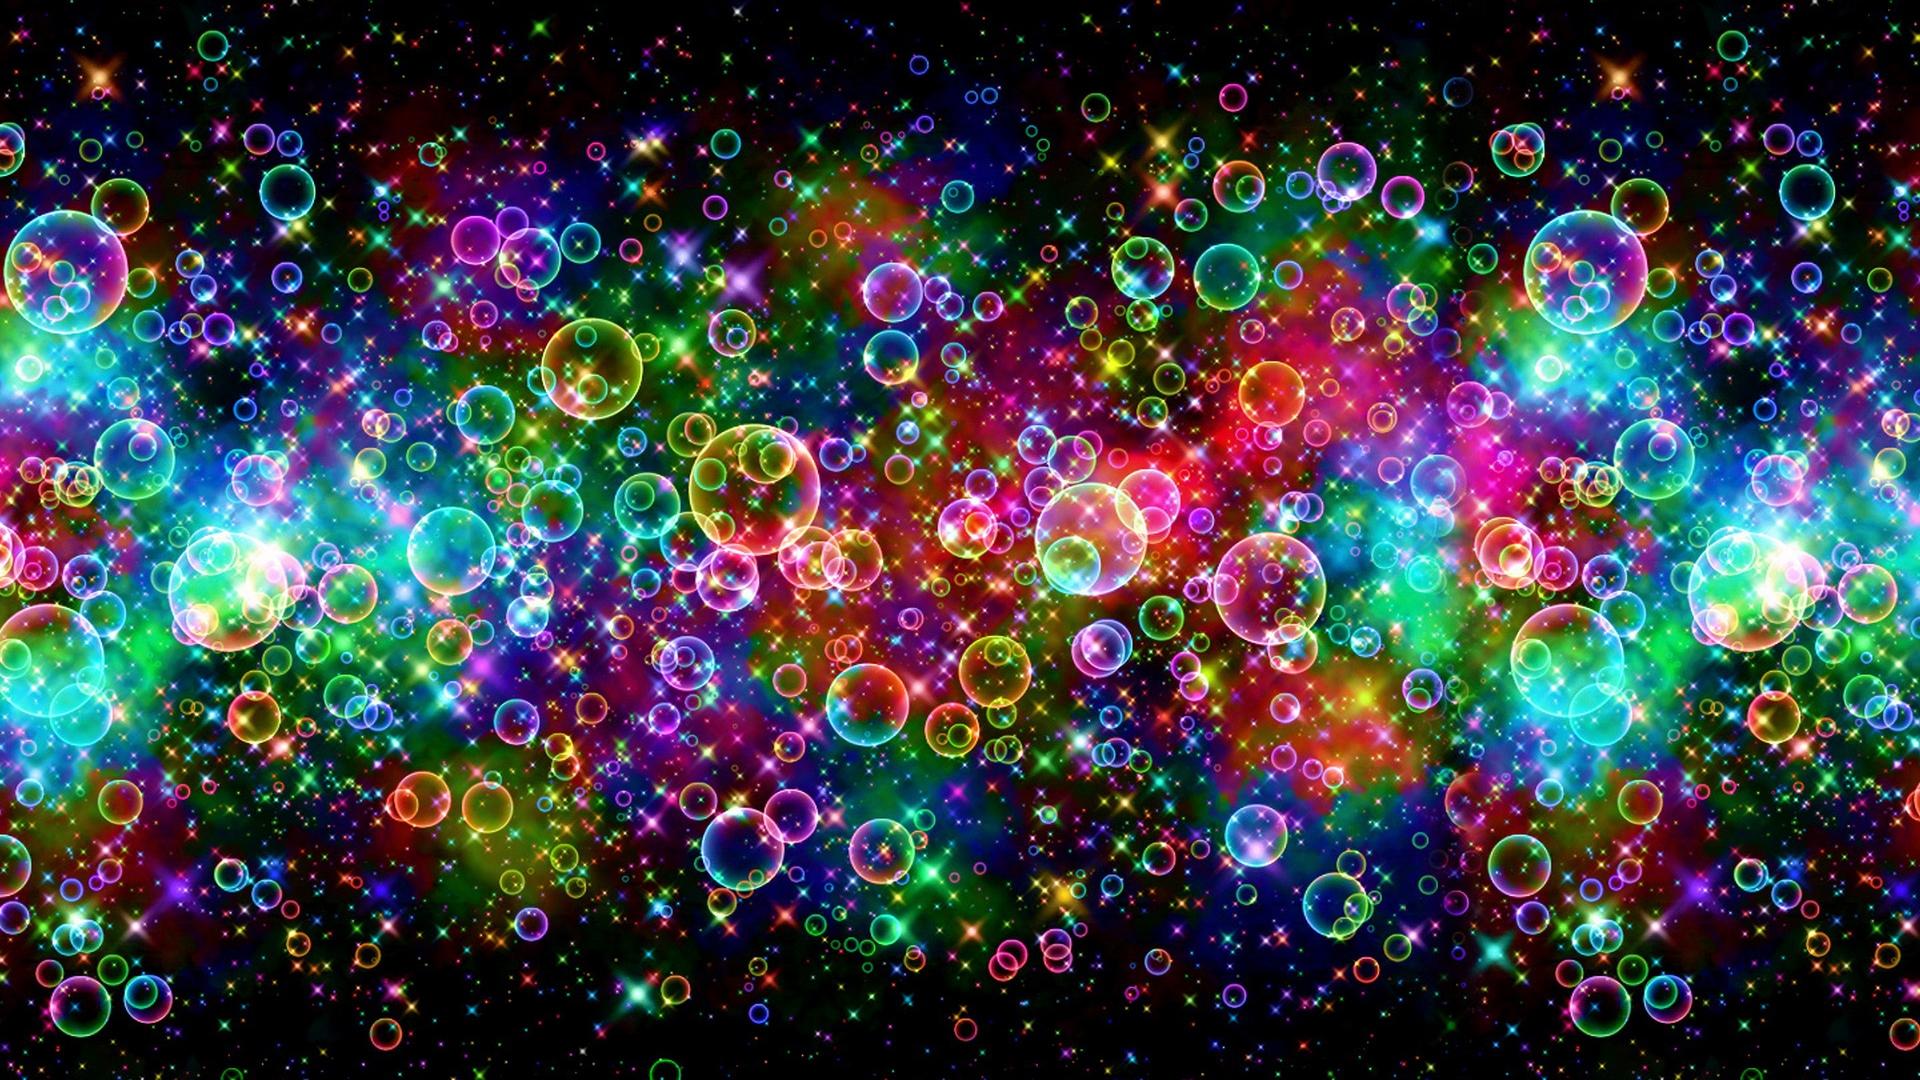 Description Colorful Bubbles Wallpaper is a hi res Wallpaper for pc 1920x1080